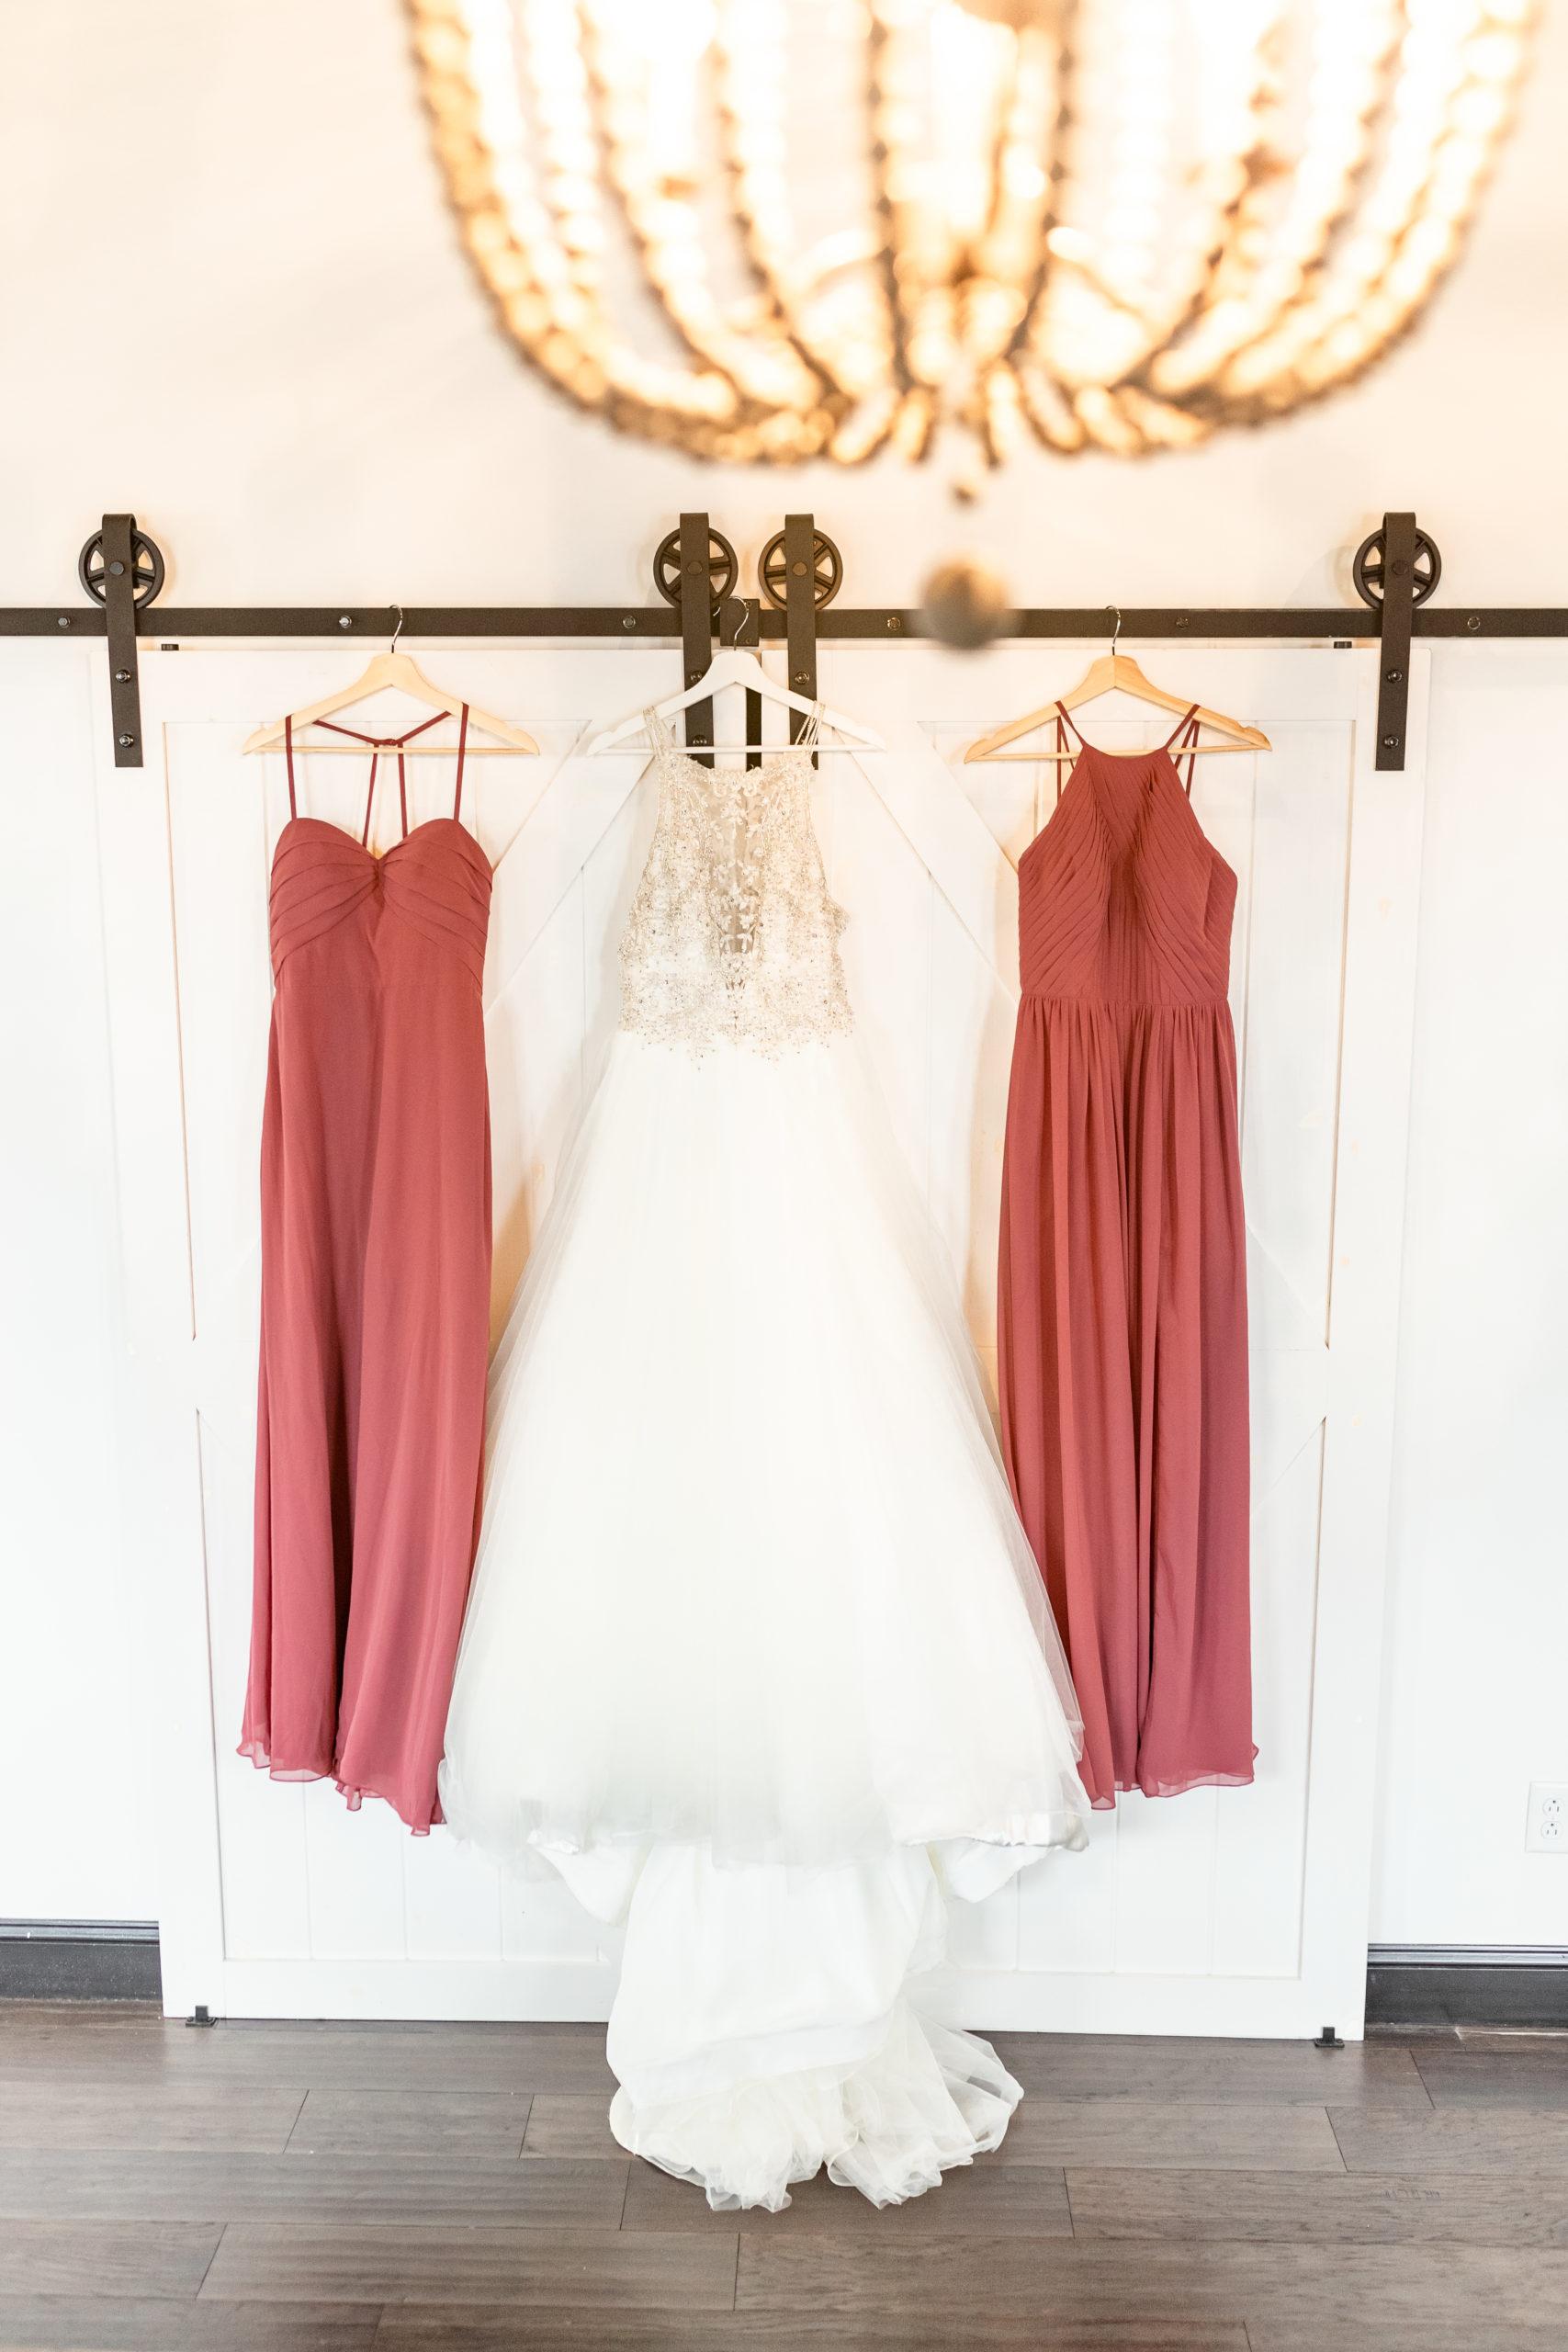 southern illinois photographer, dresses, halter neck wedding dress, rusty rose bride's maid dresses, hanging dresses